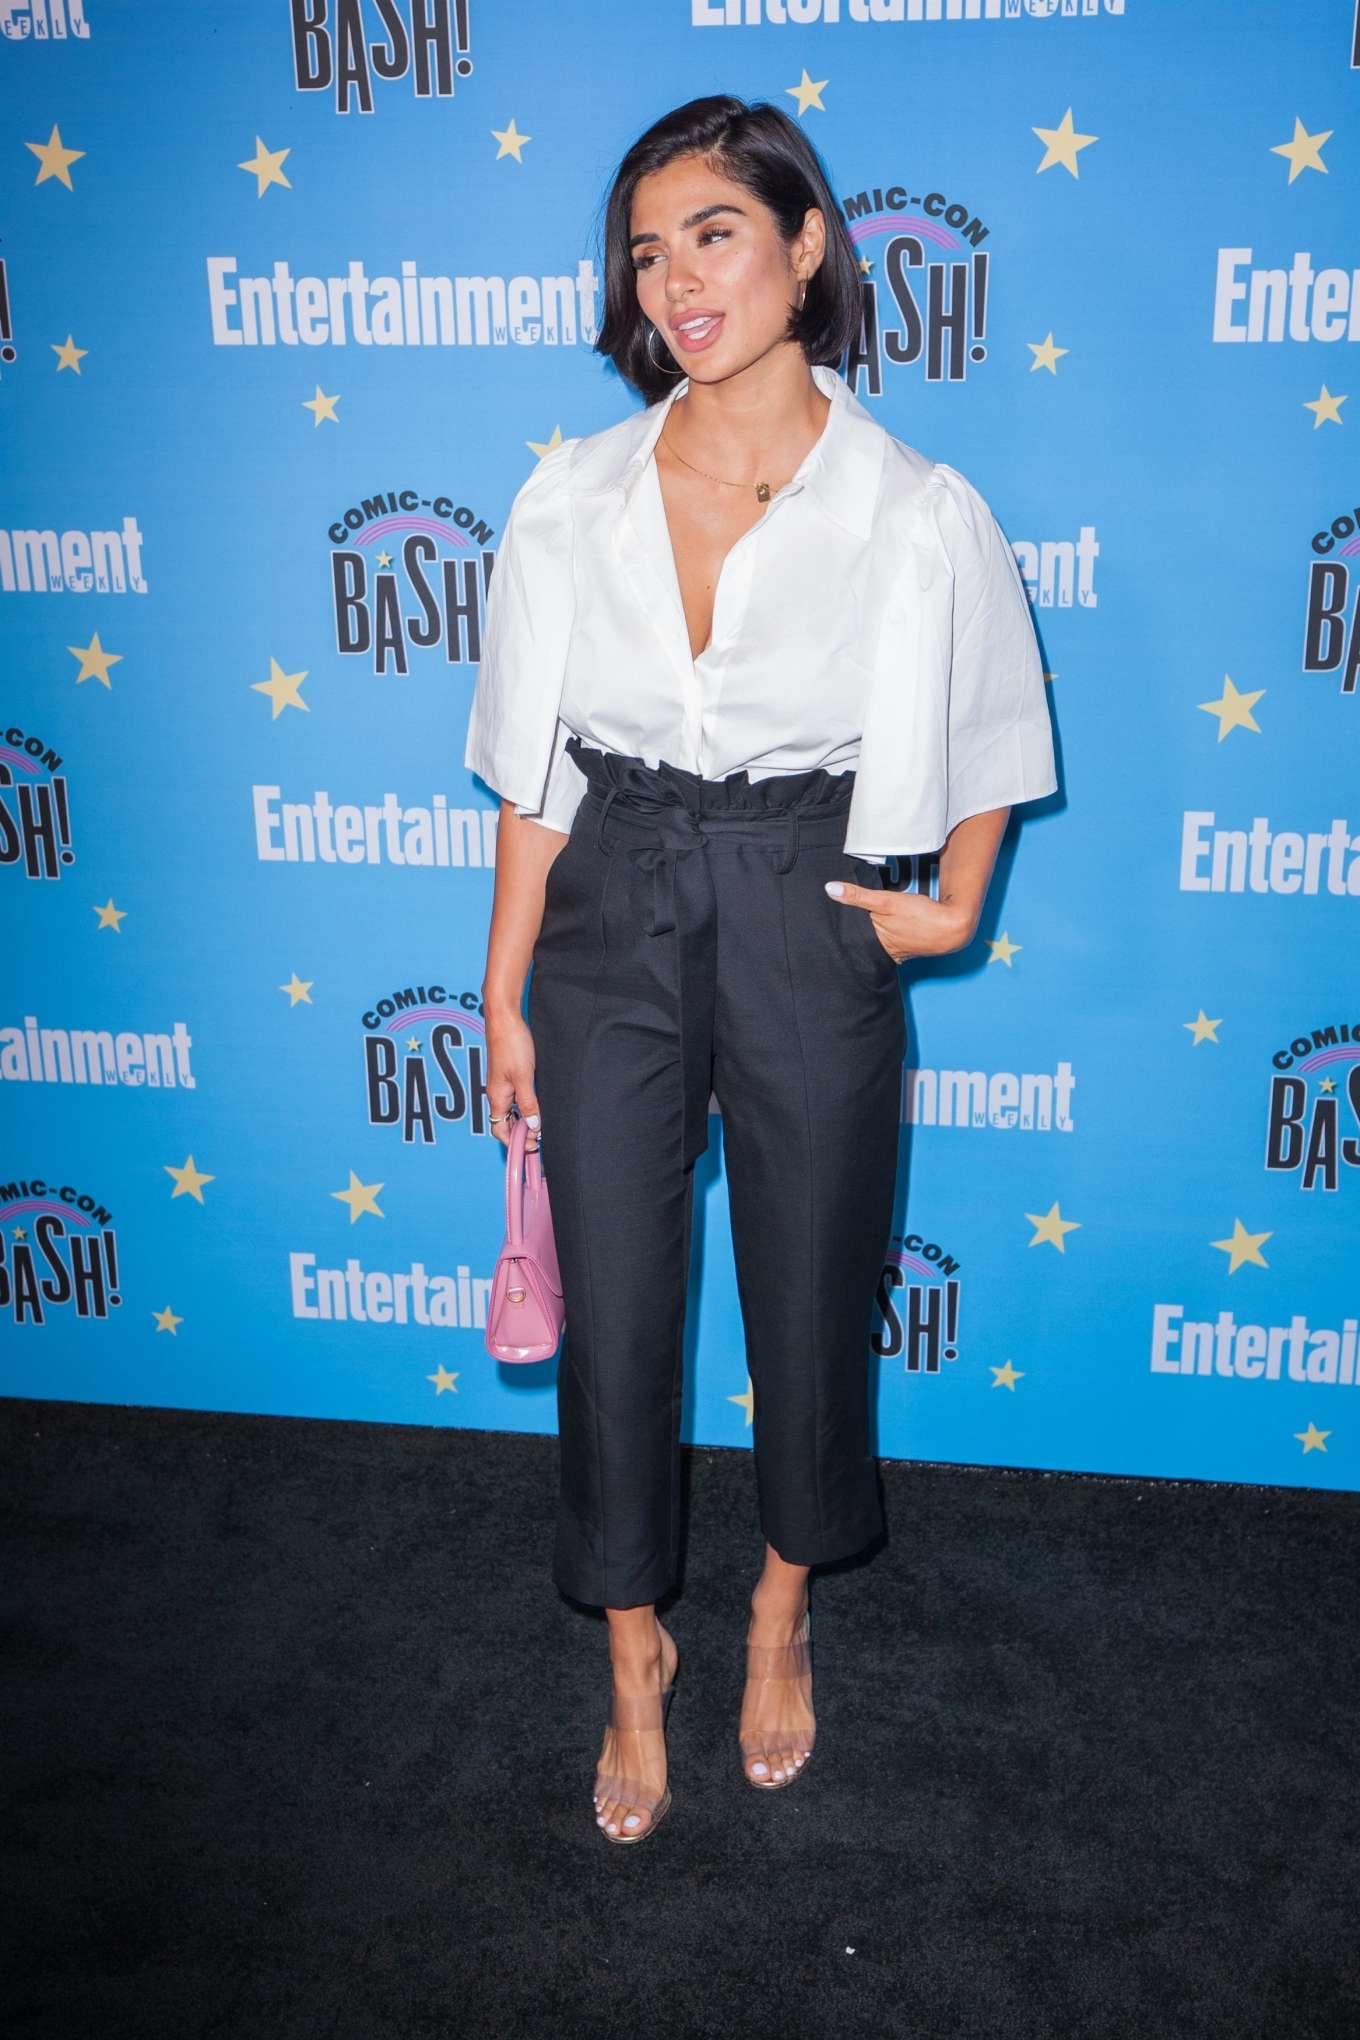 Diane Guerrero - 2019 Entertainment Weekly Comic Con Party in San Diego